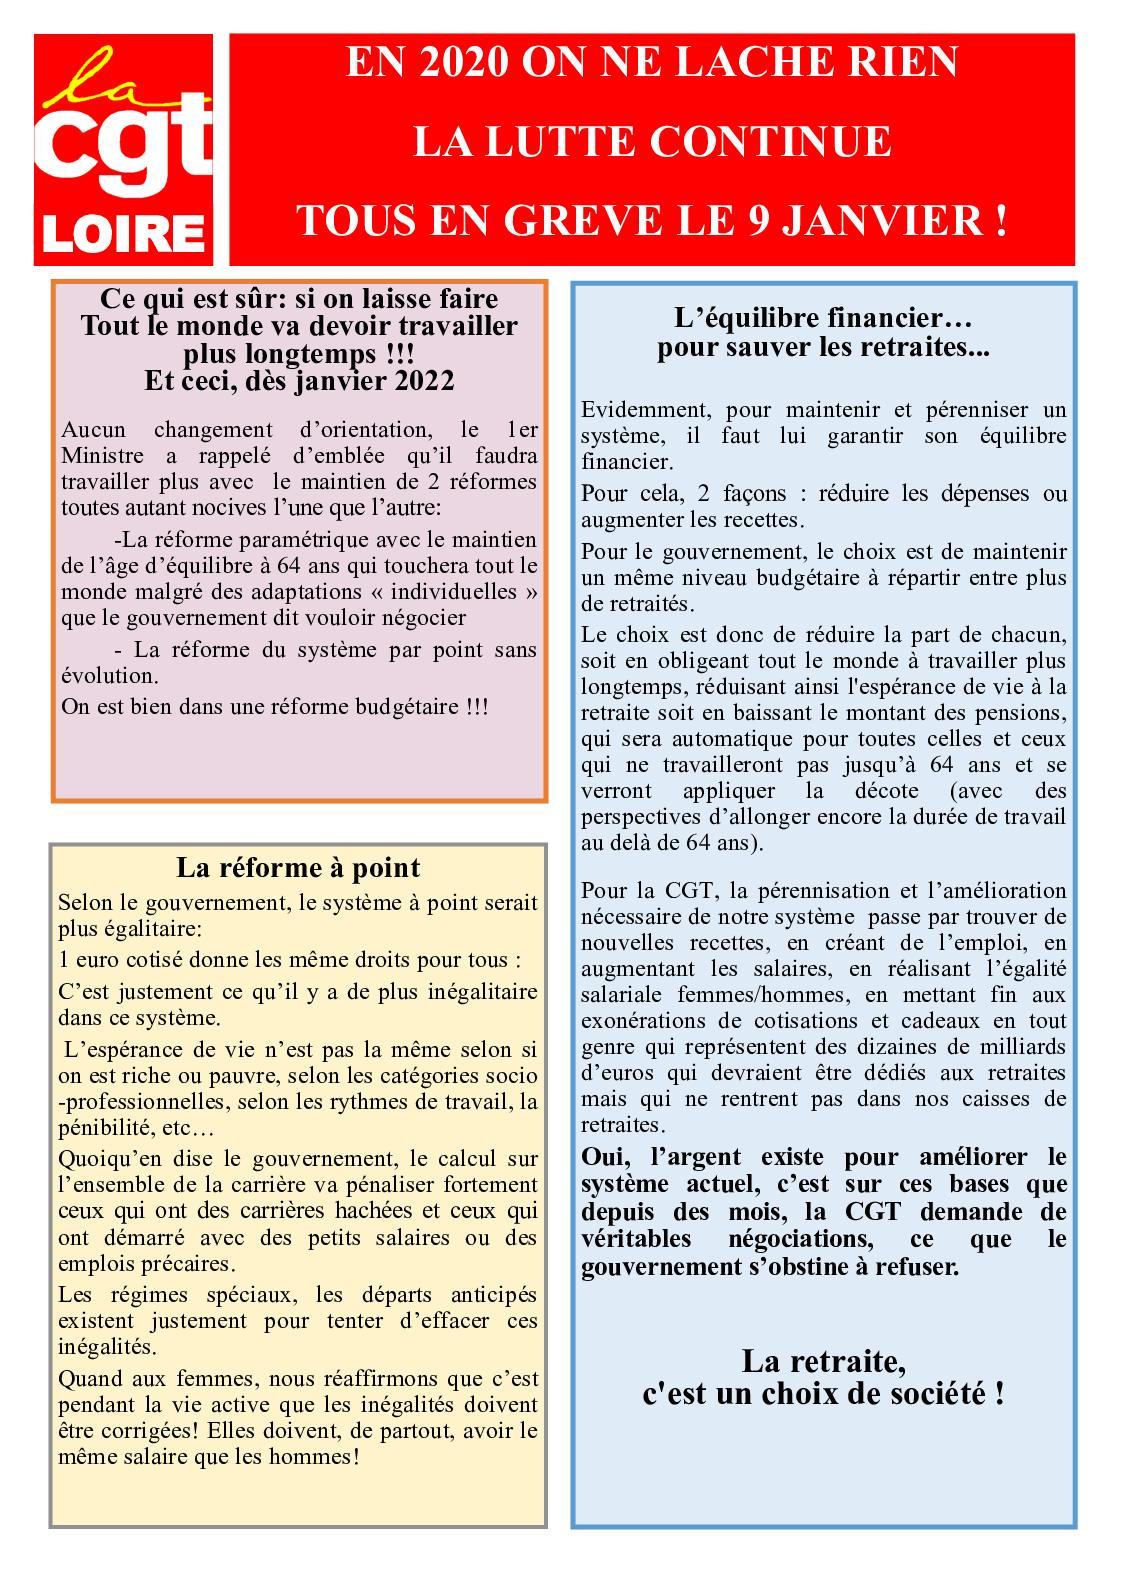 Tract CGT Loire 09 janvier 2020